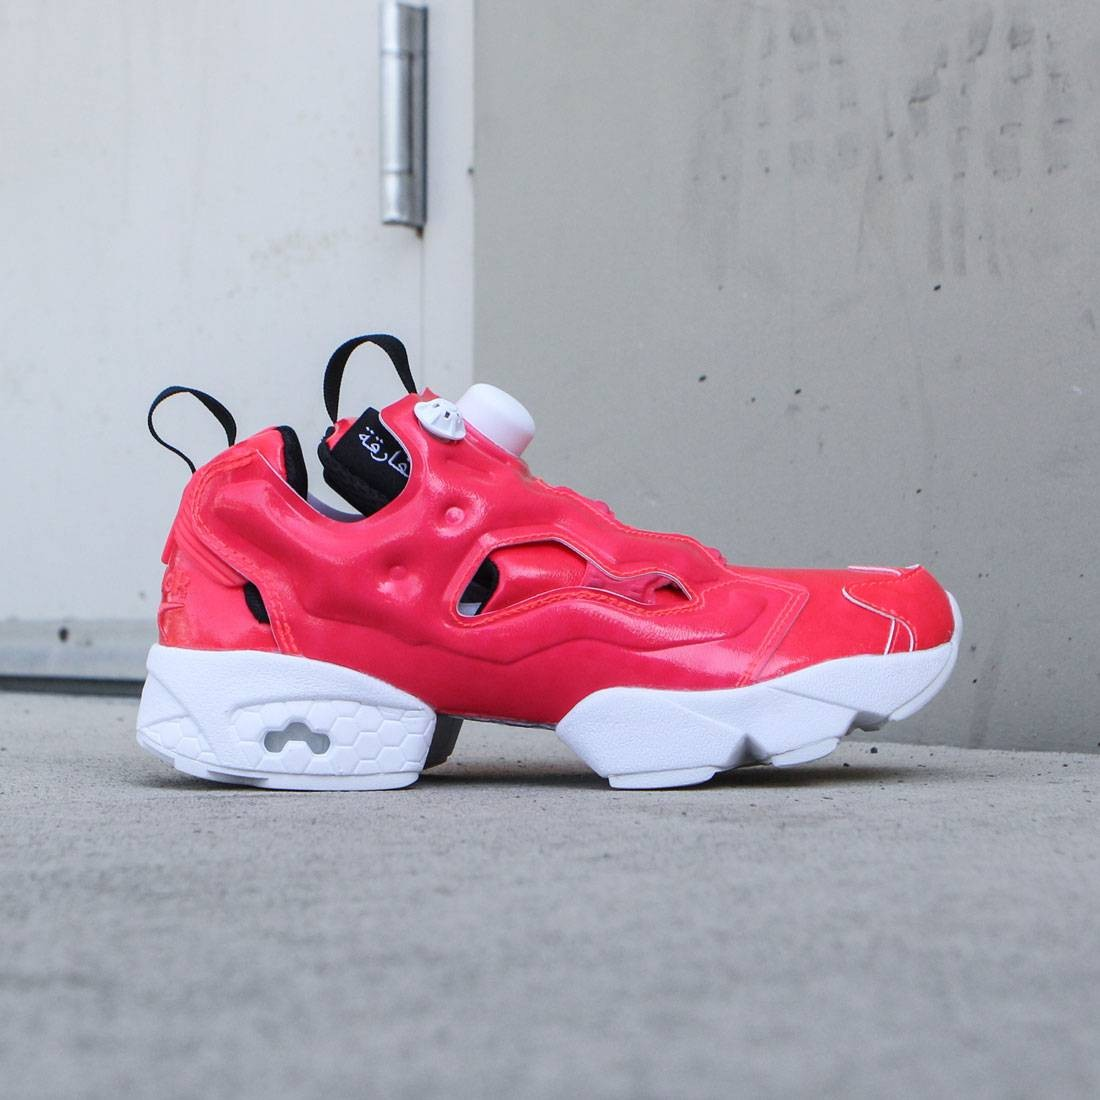 10efc9f9929e Reebok Women InstaPump Fury Overbranded pink neon cherry white black